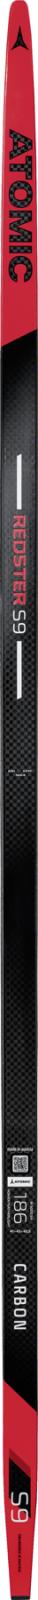 Atomic Redster S9 Carbon Plus X Stiff